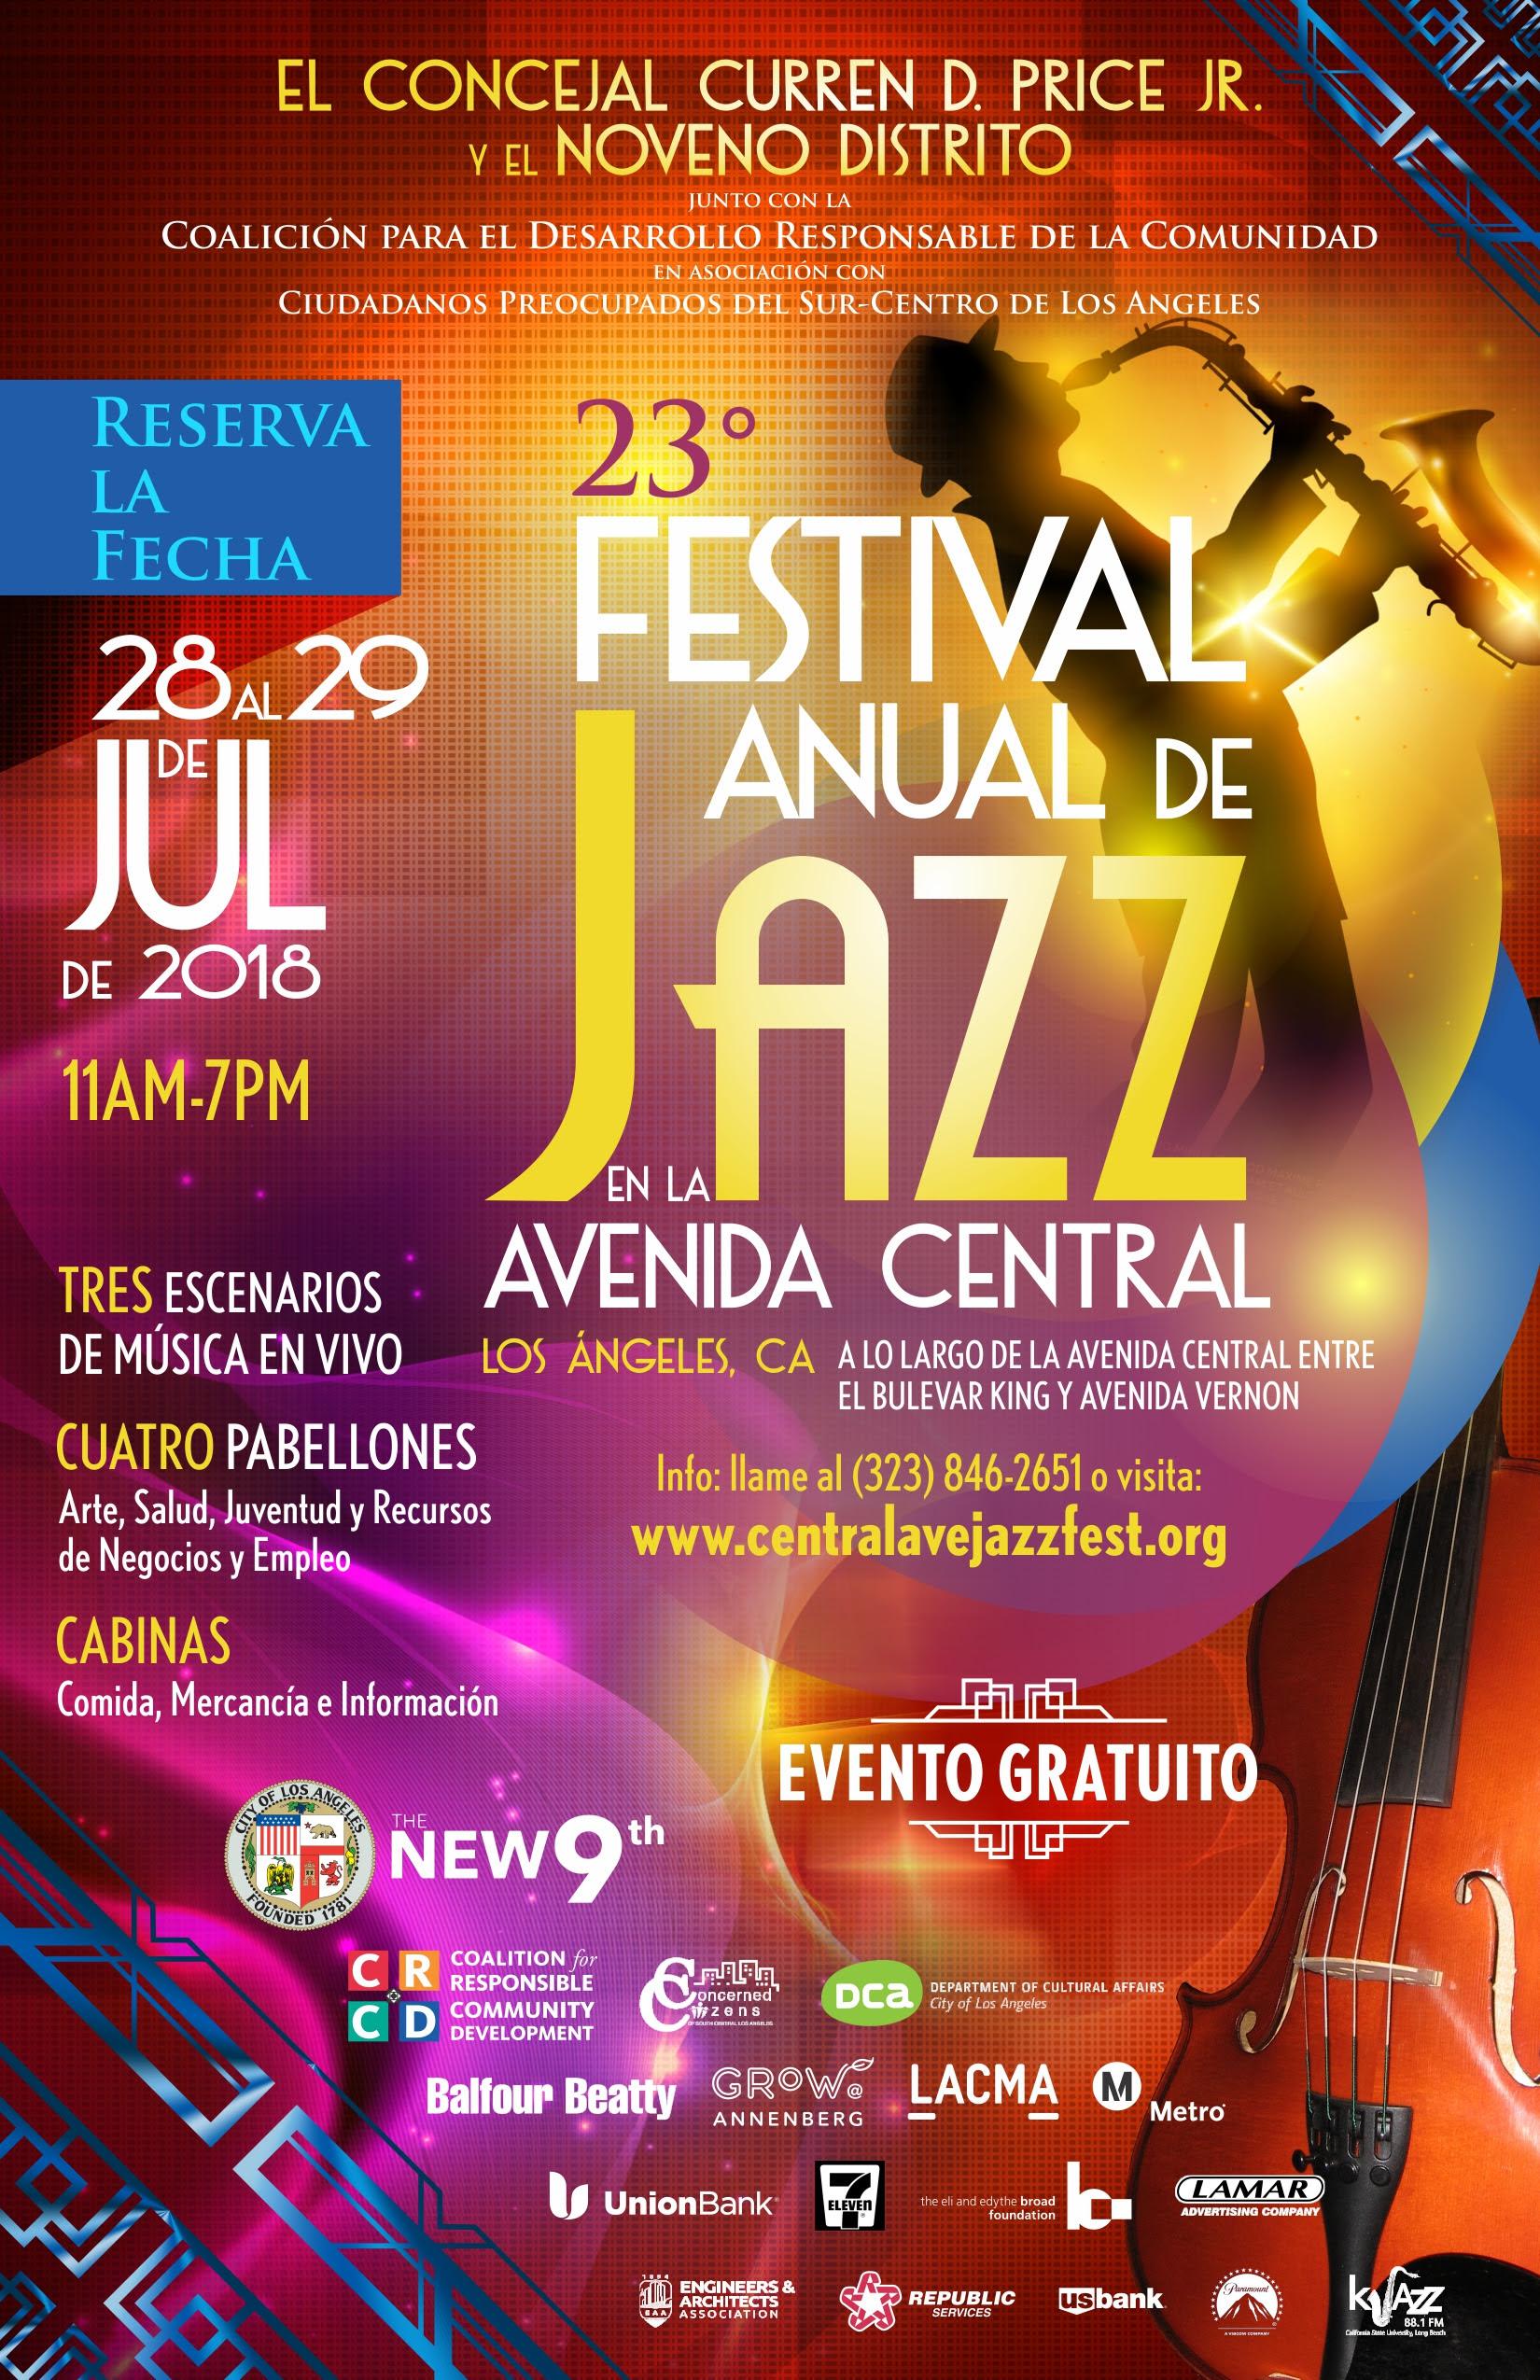 Jazz Festival Flyer in Spanish